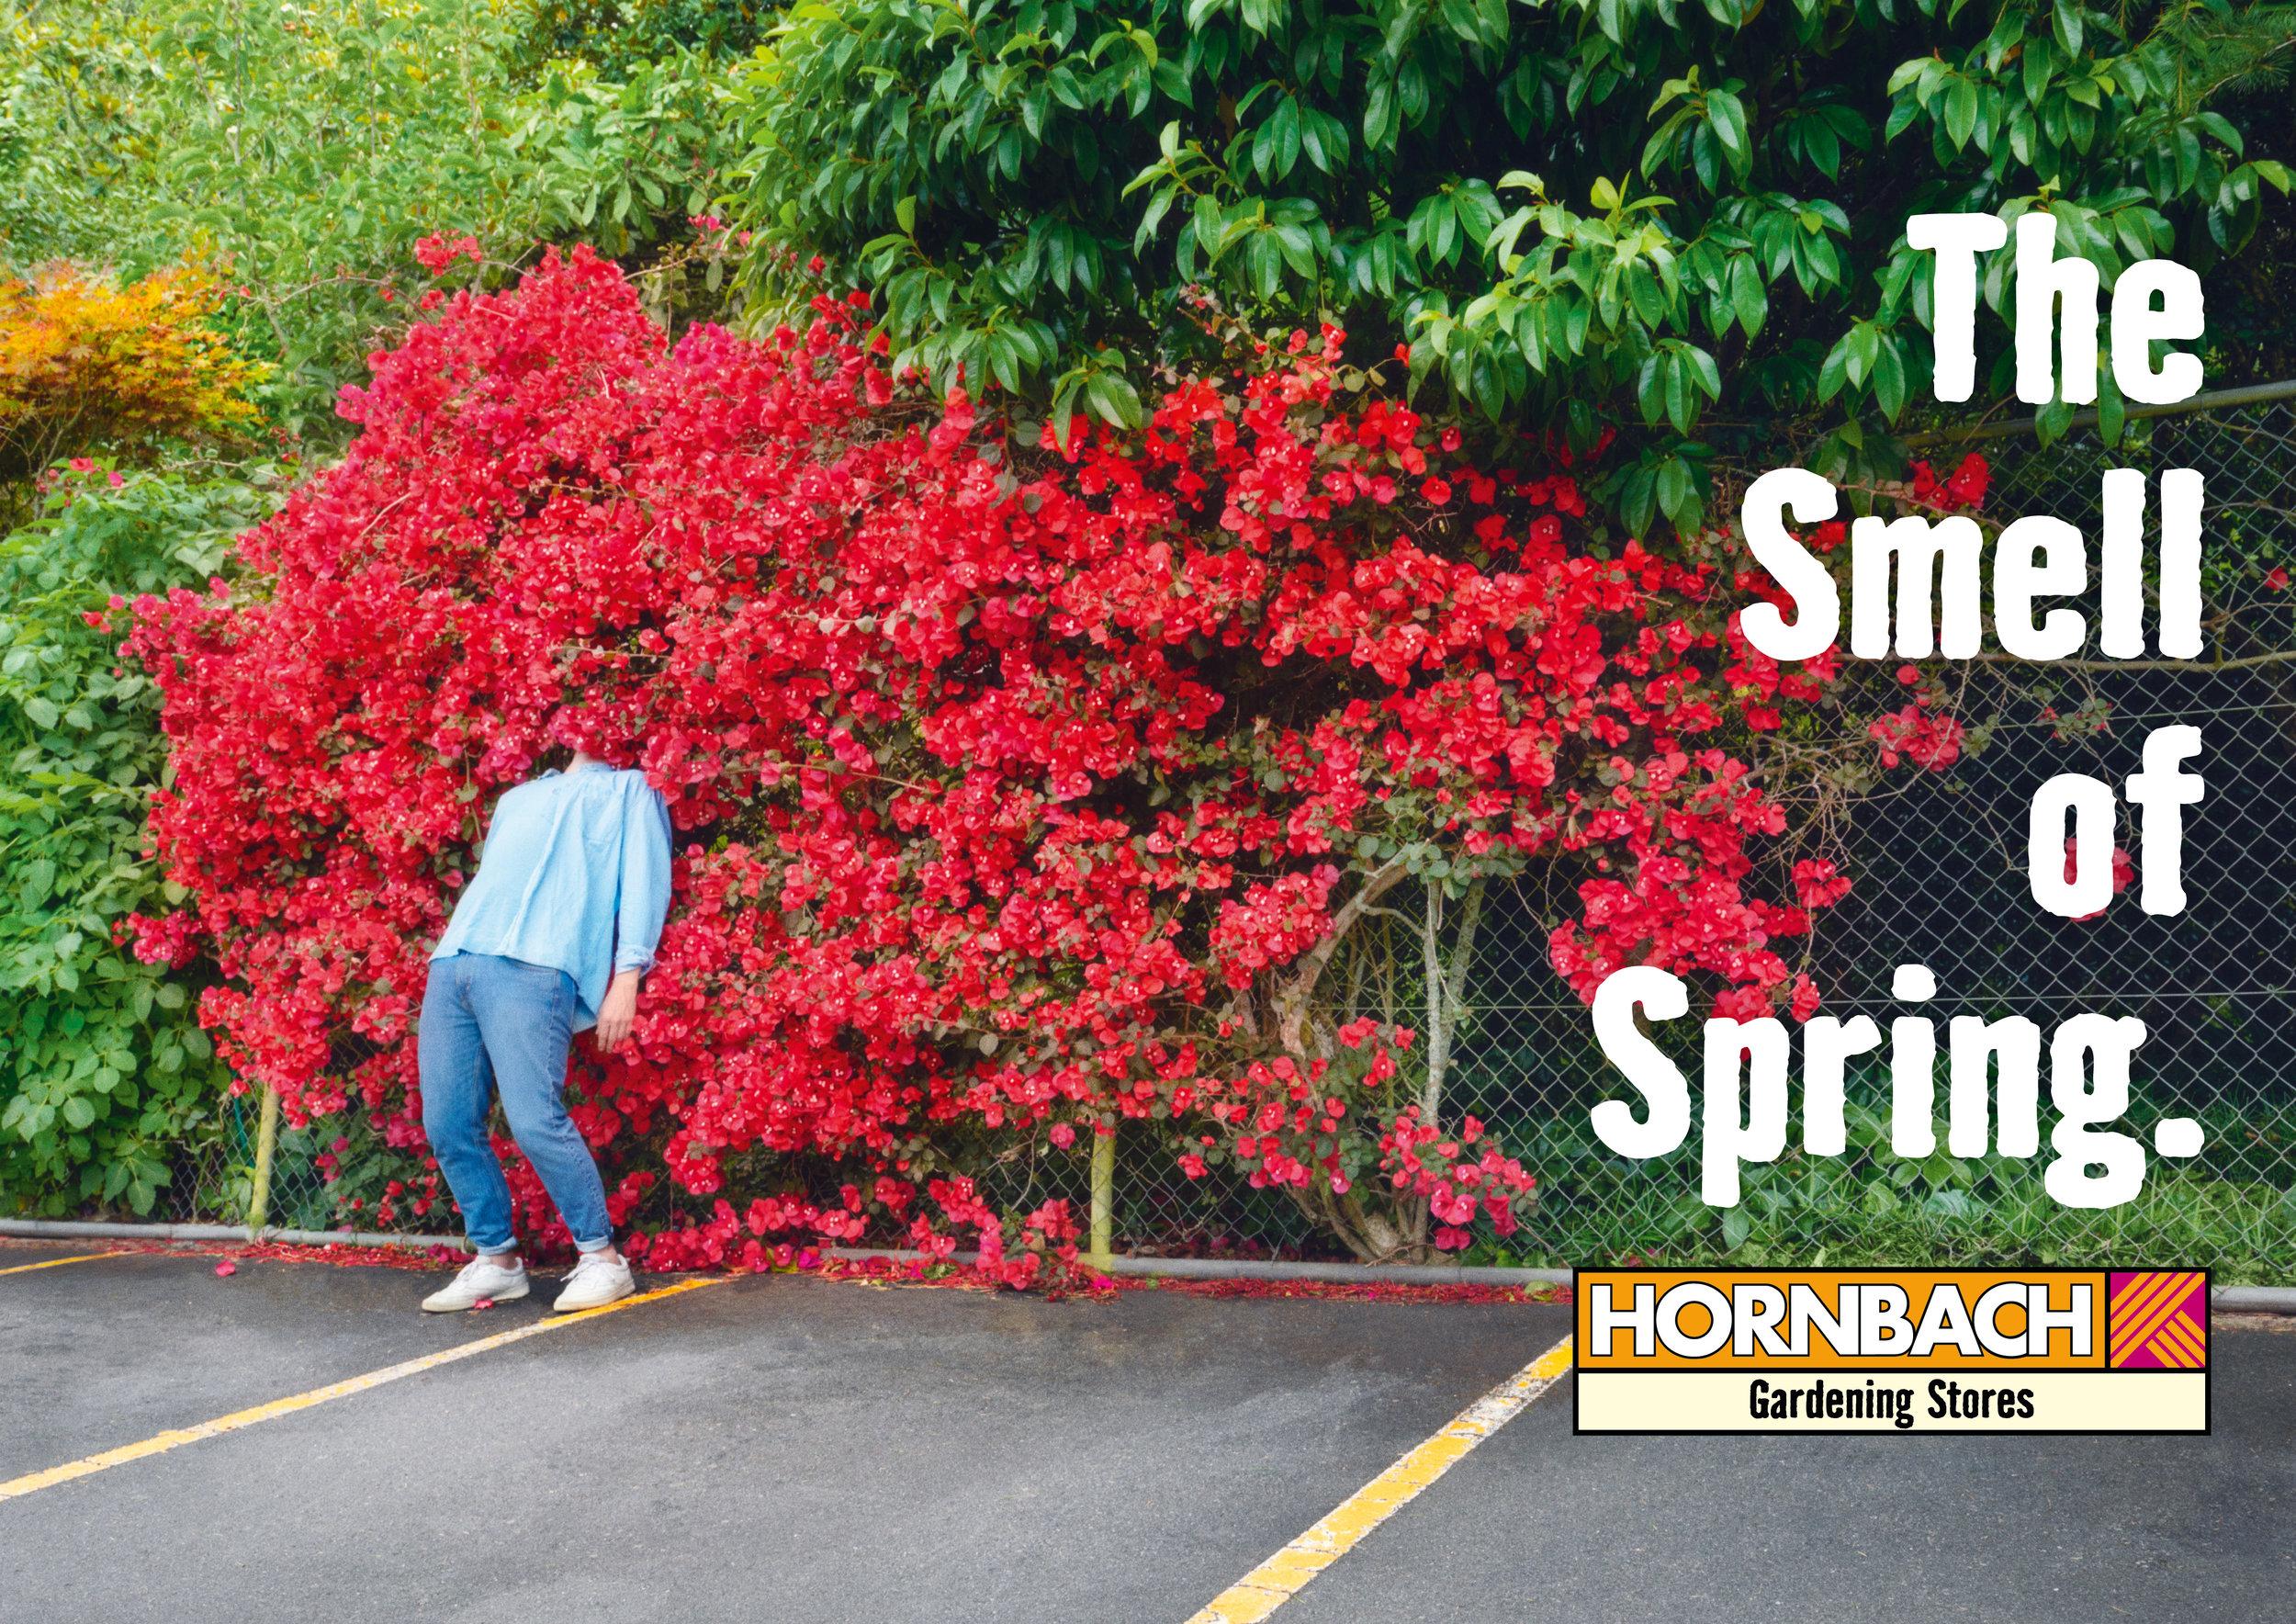 HORNBACH_Smell_of_Spring_ParkingLot_RGB.jpg